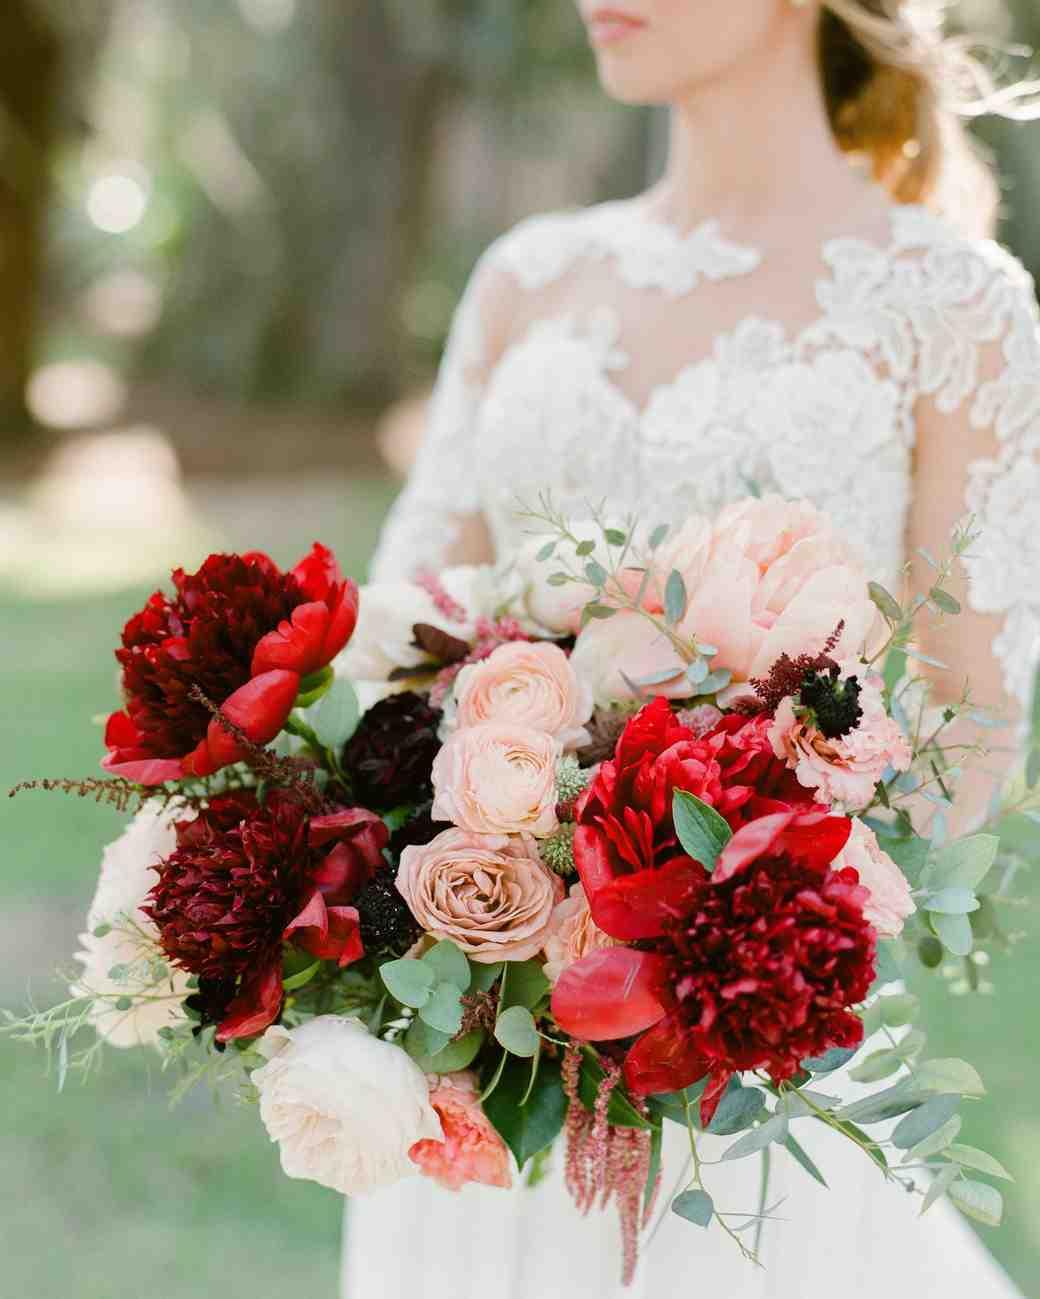 fall-wedding-bouquets-the-happy-bloom-0518_vert.jpg